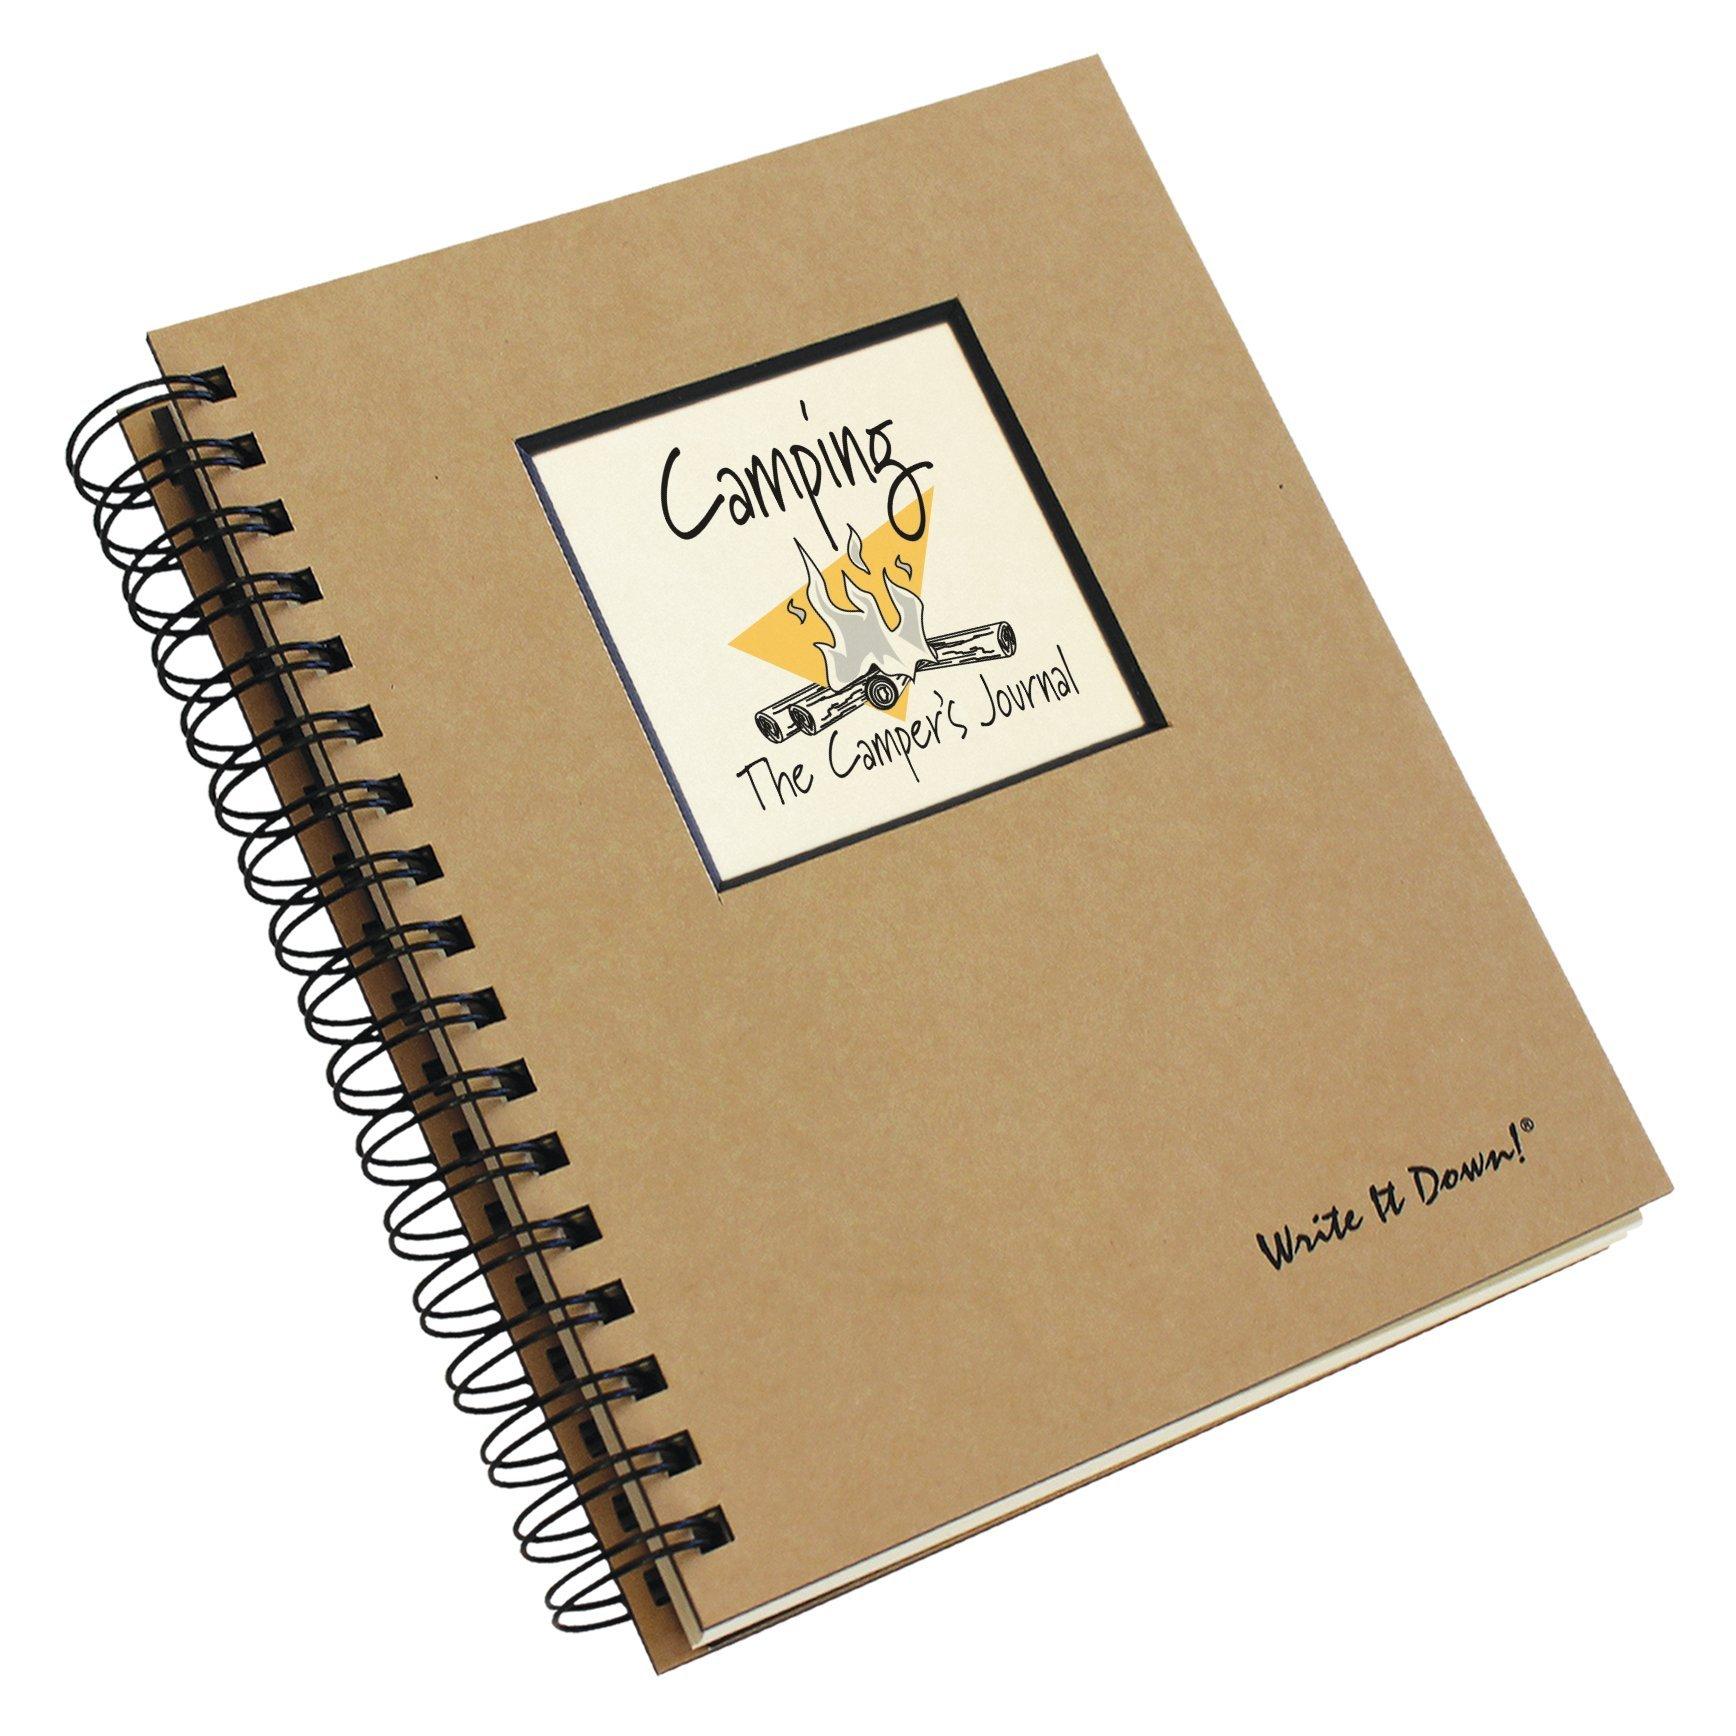 Camping: The Camper's Journal Spiral-bound – Jan 1 2013 Barbara Morina Journals Unlimited 1892033011 JU-03